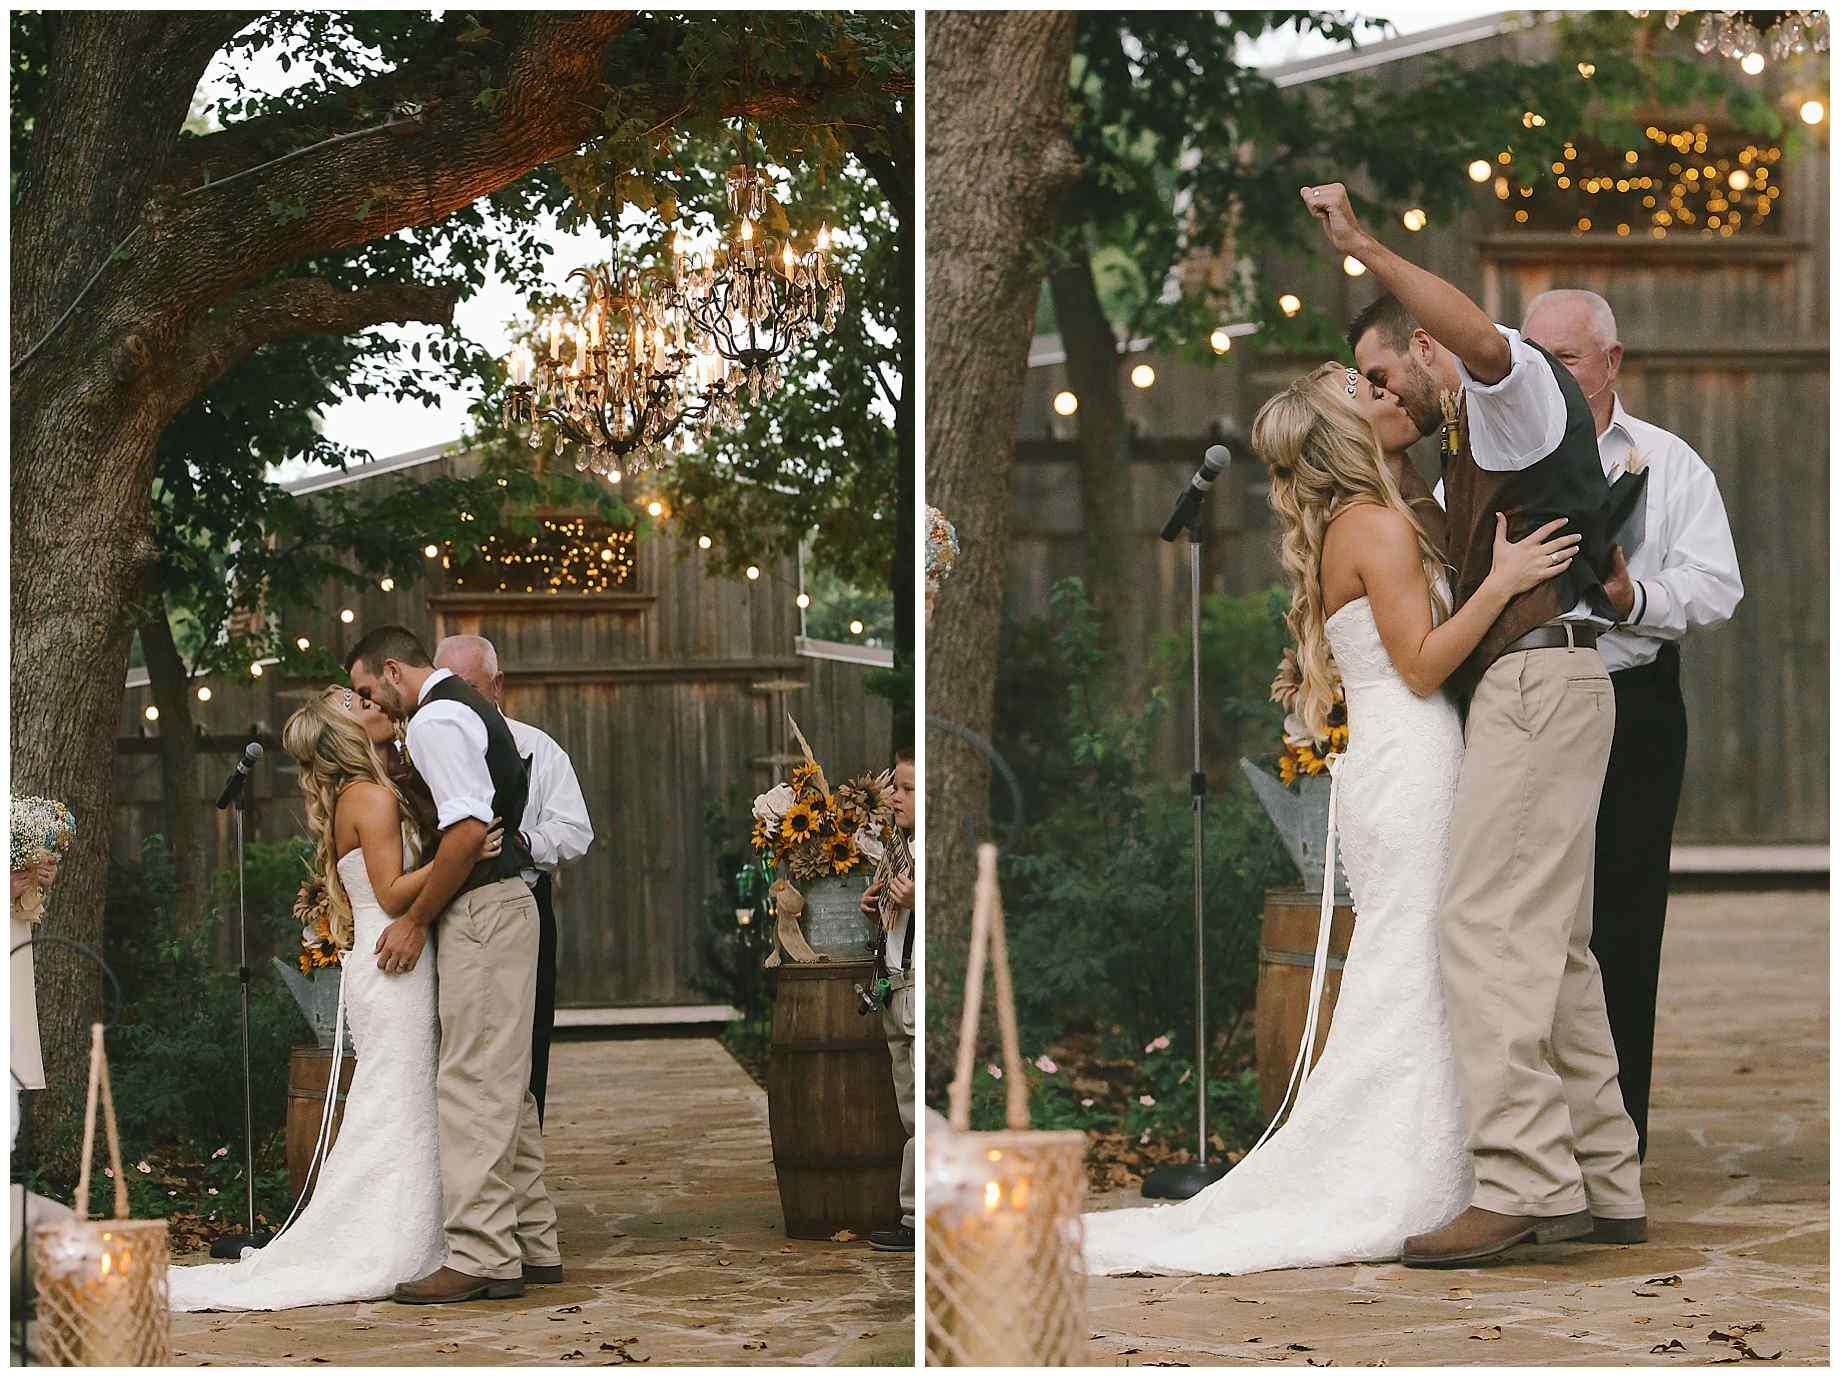 stone-oak-ranch-outdoor-wedding-020